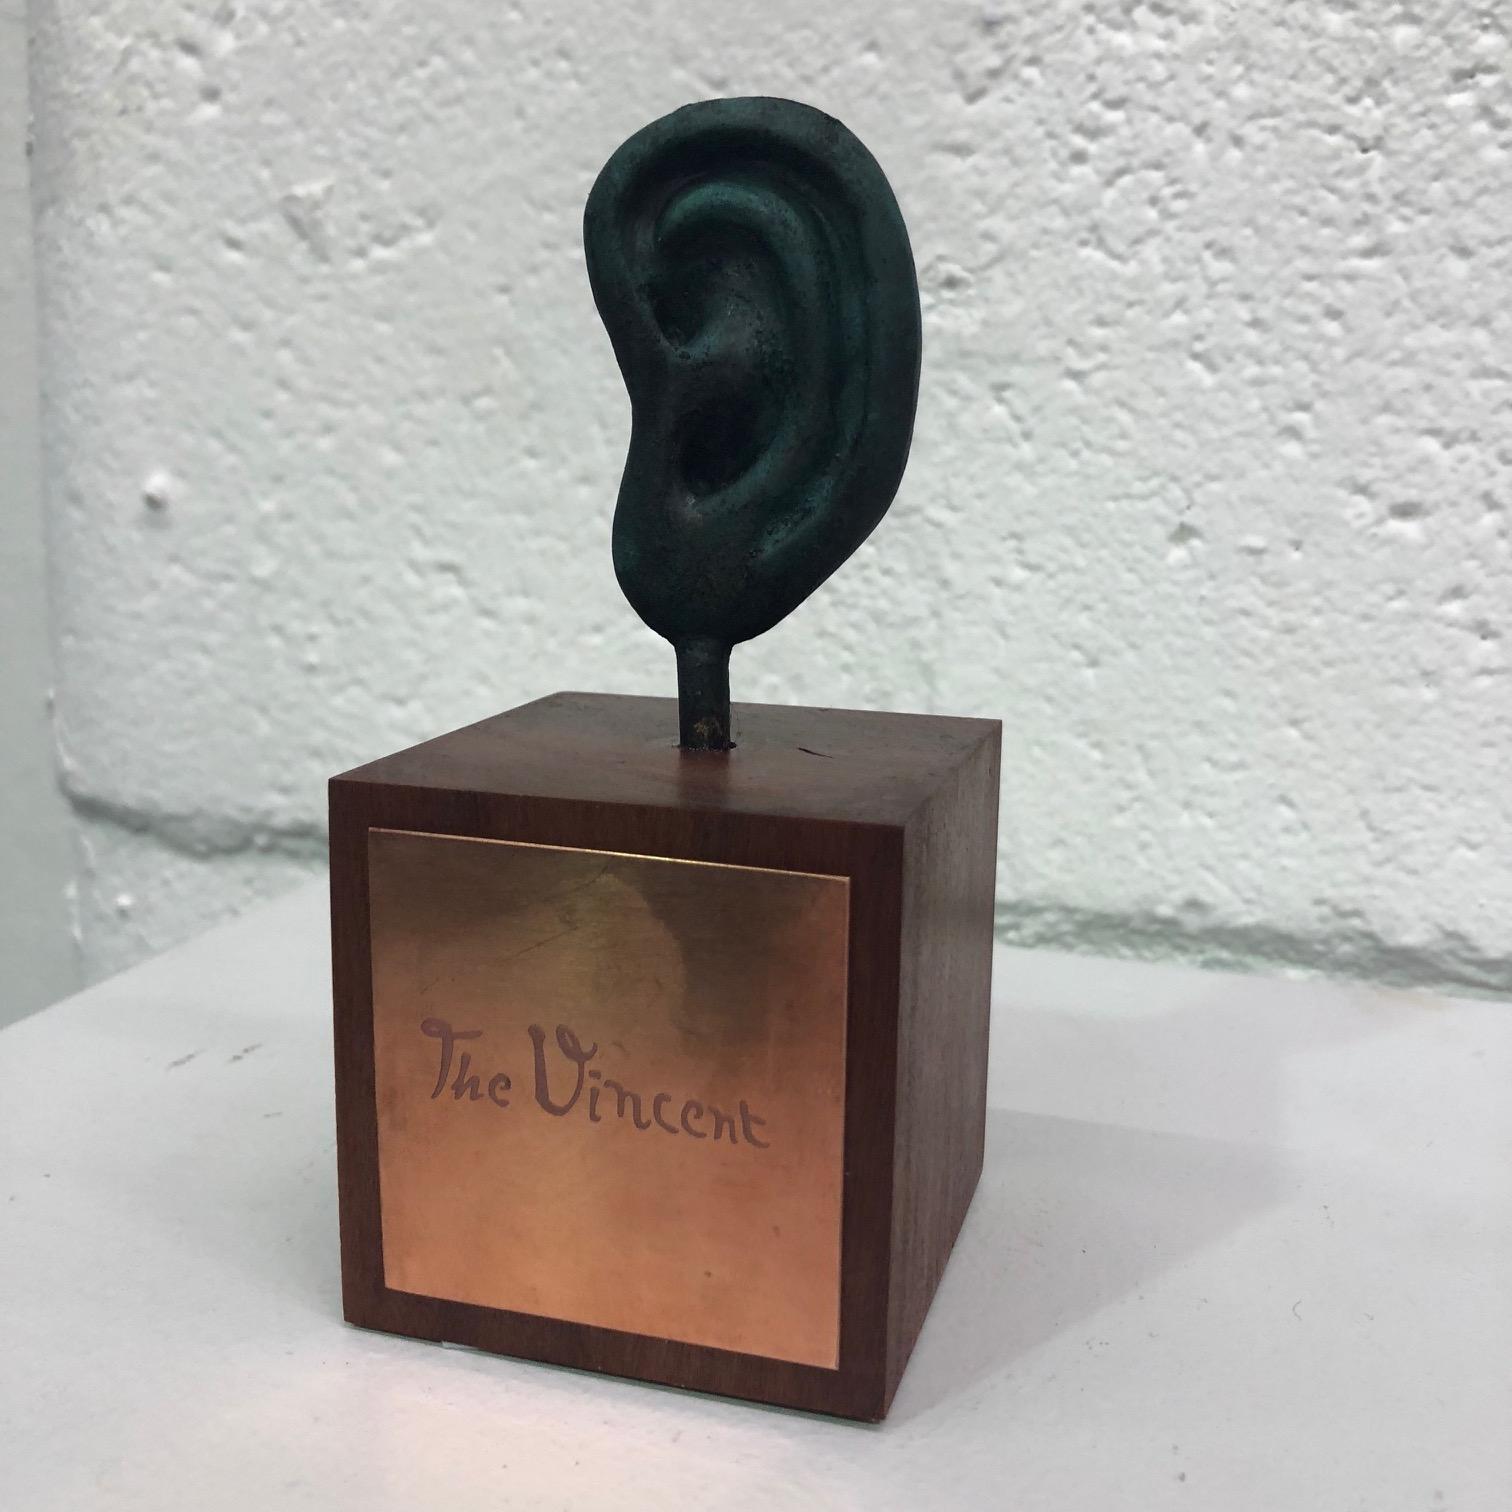 Inaugural Vincent Art Prize Trophy